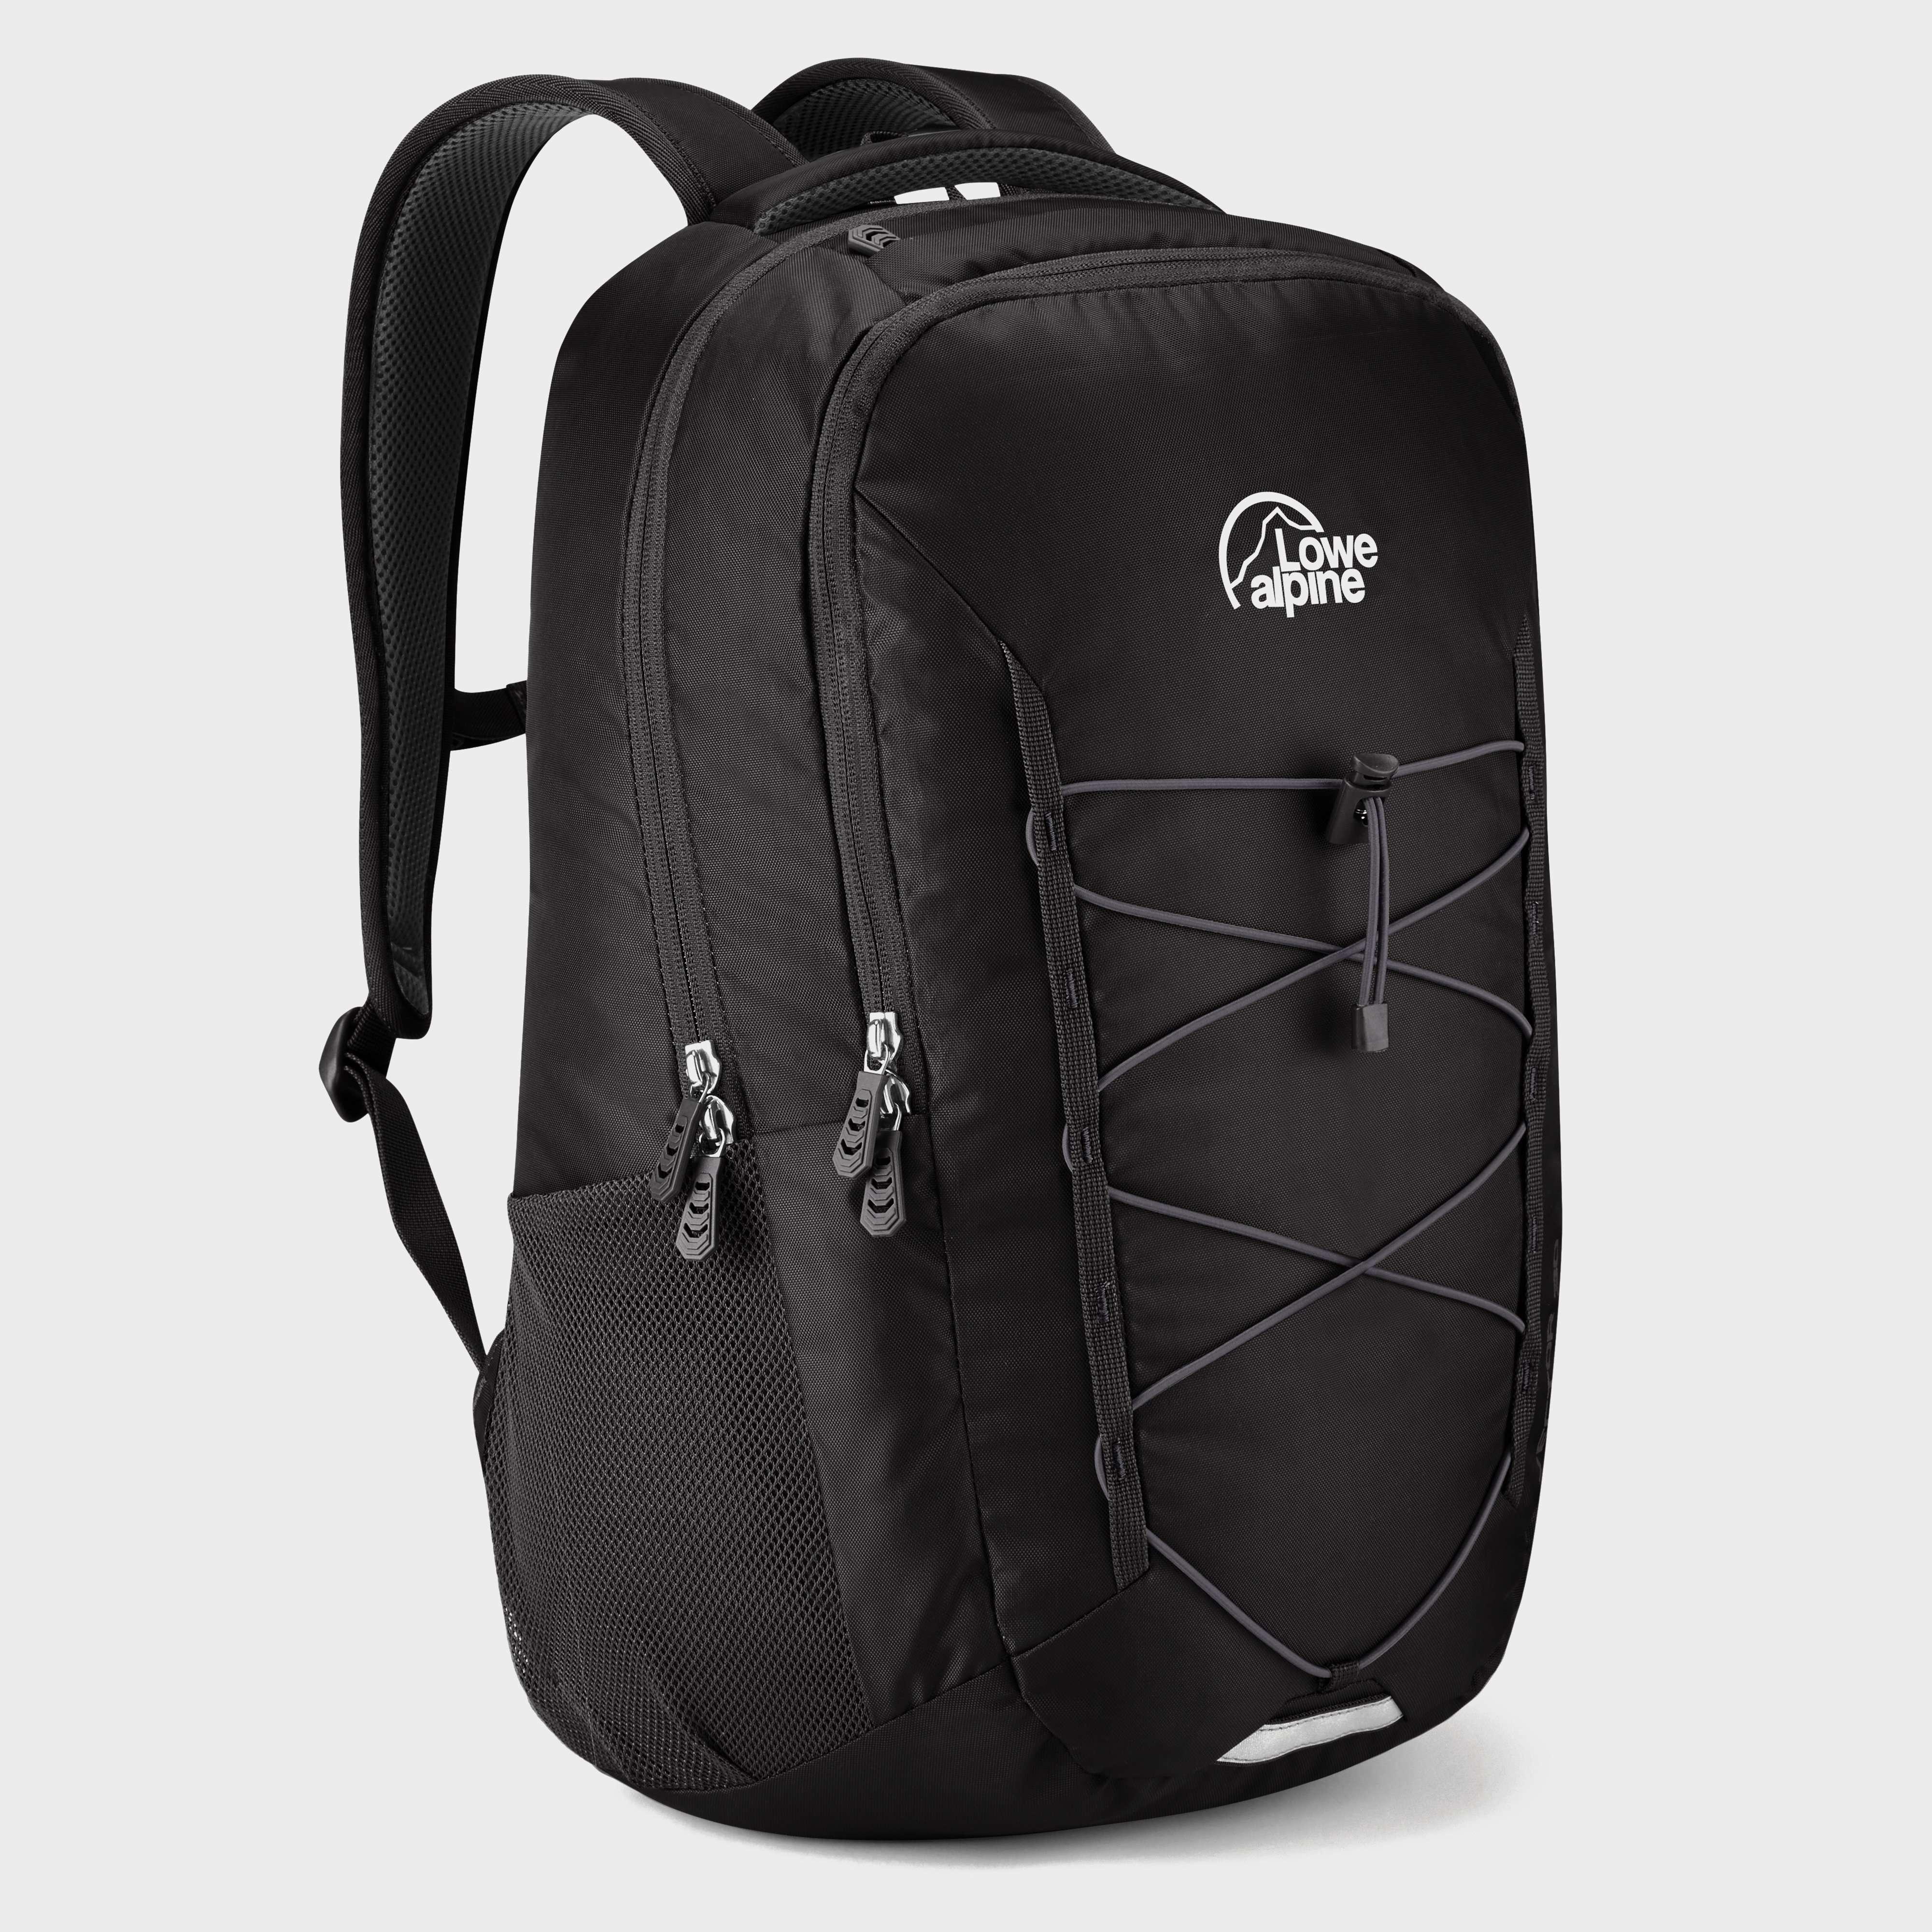 LOWE ALPINE Vector 30 Daypack